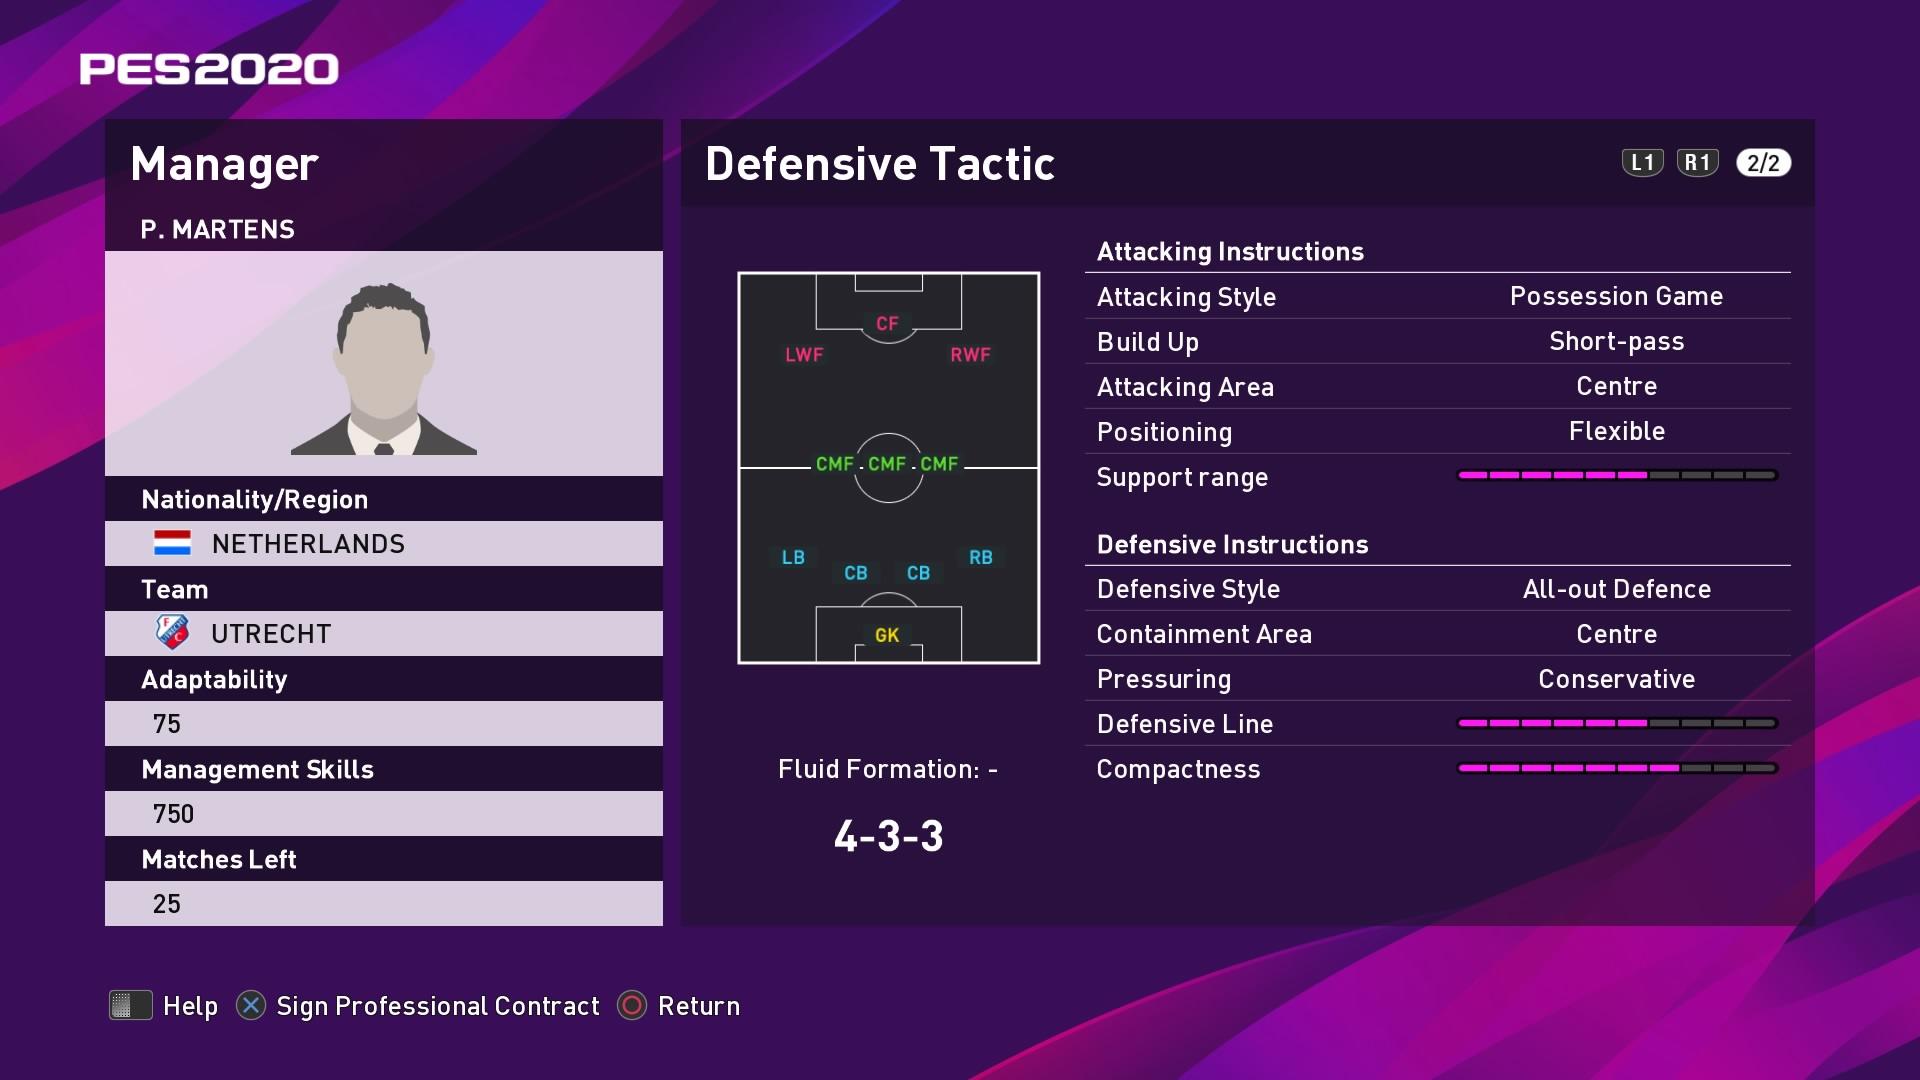 P. Martens (John van den Brom) Defensive Tactic in PES 2020 myClub